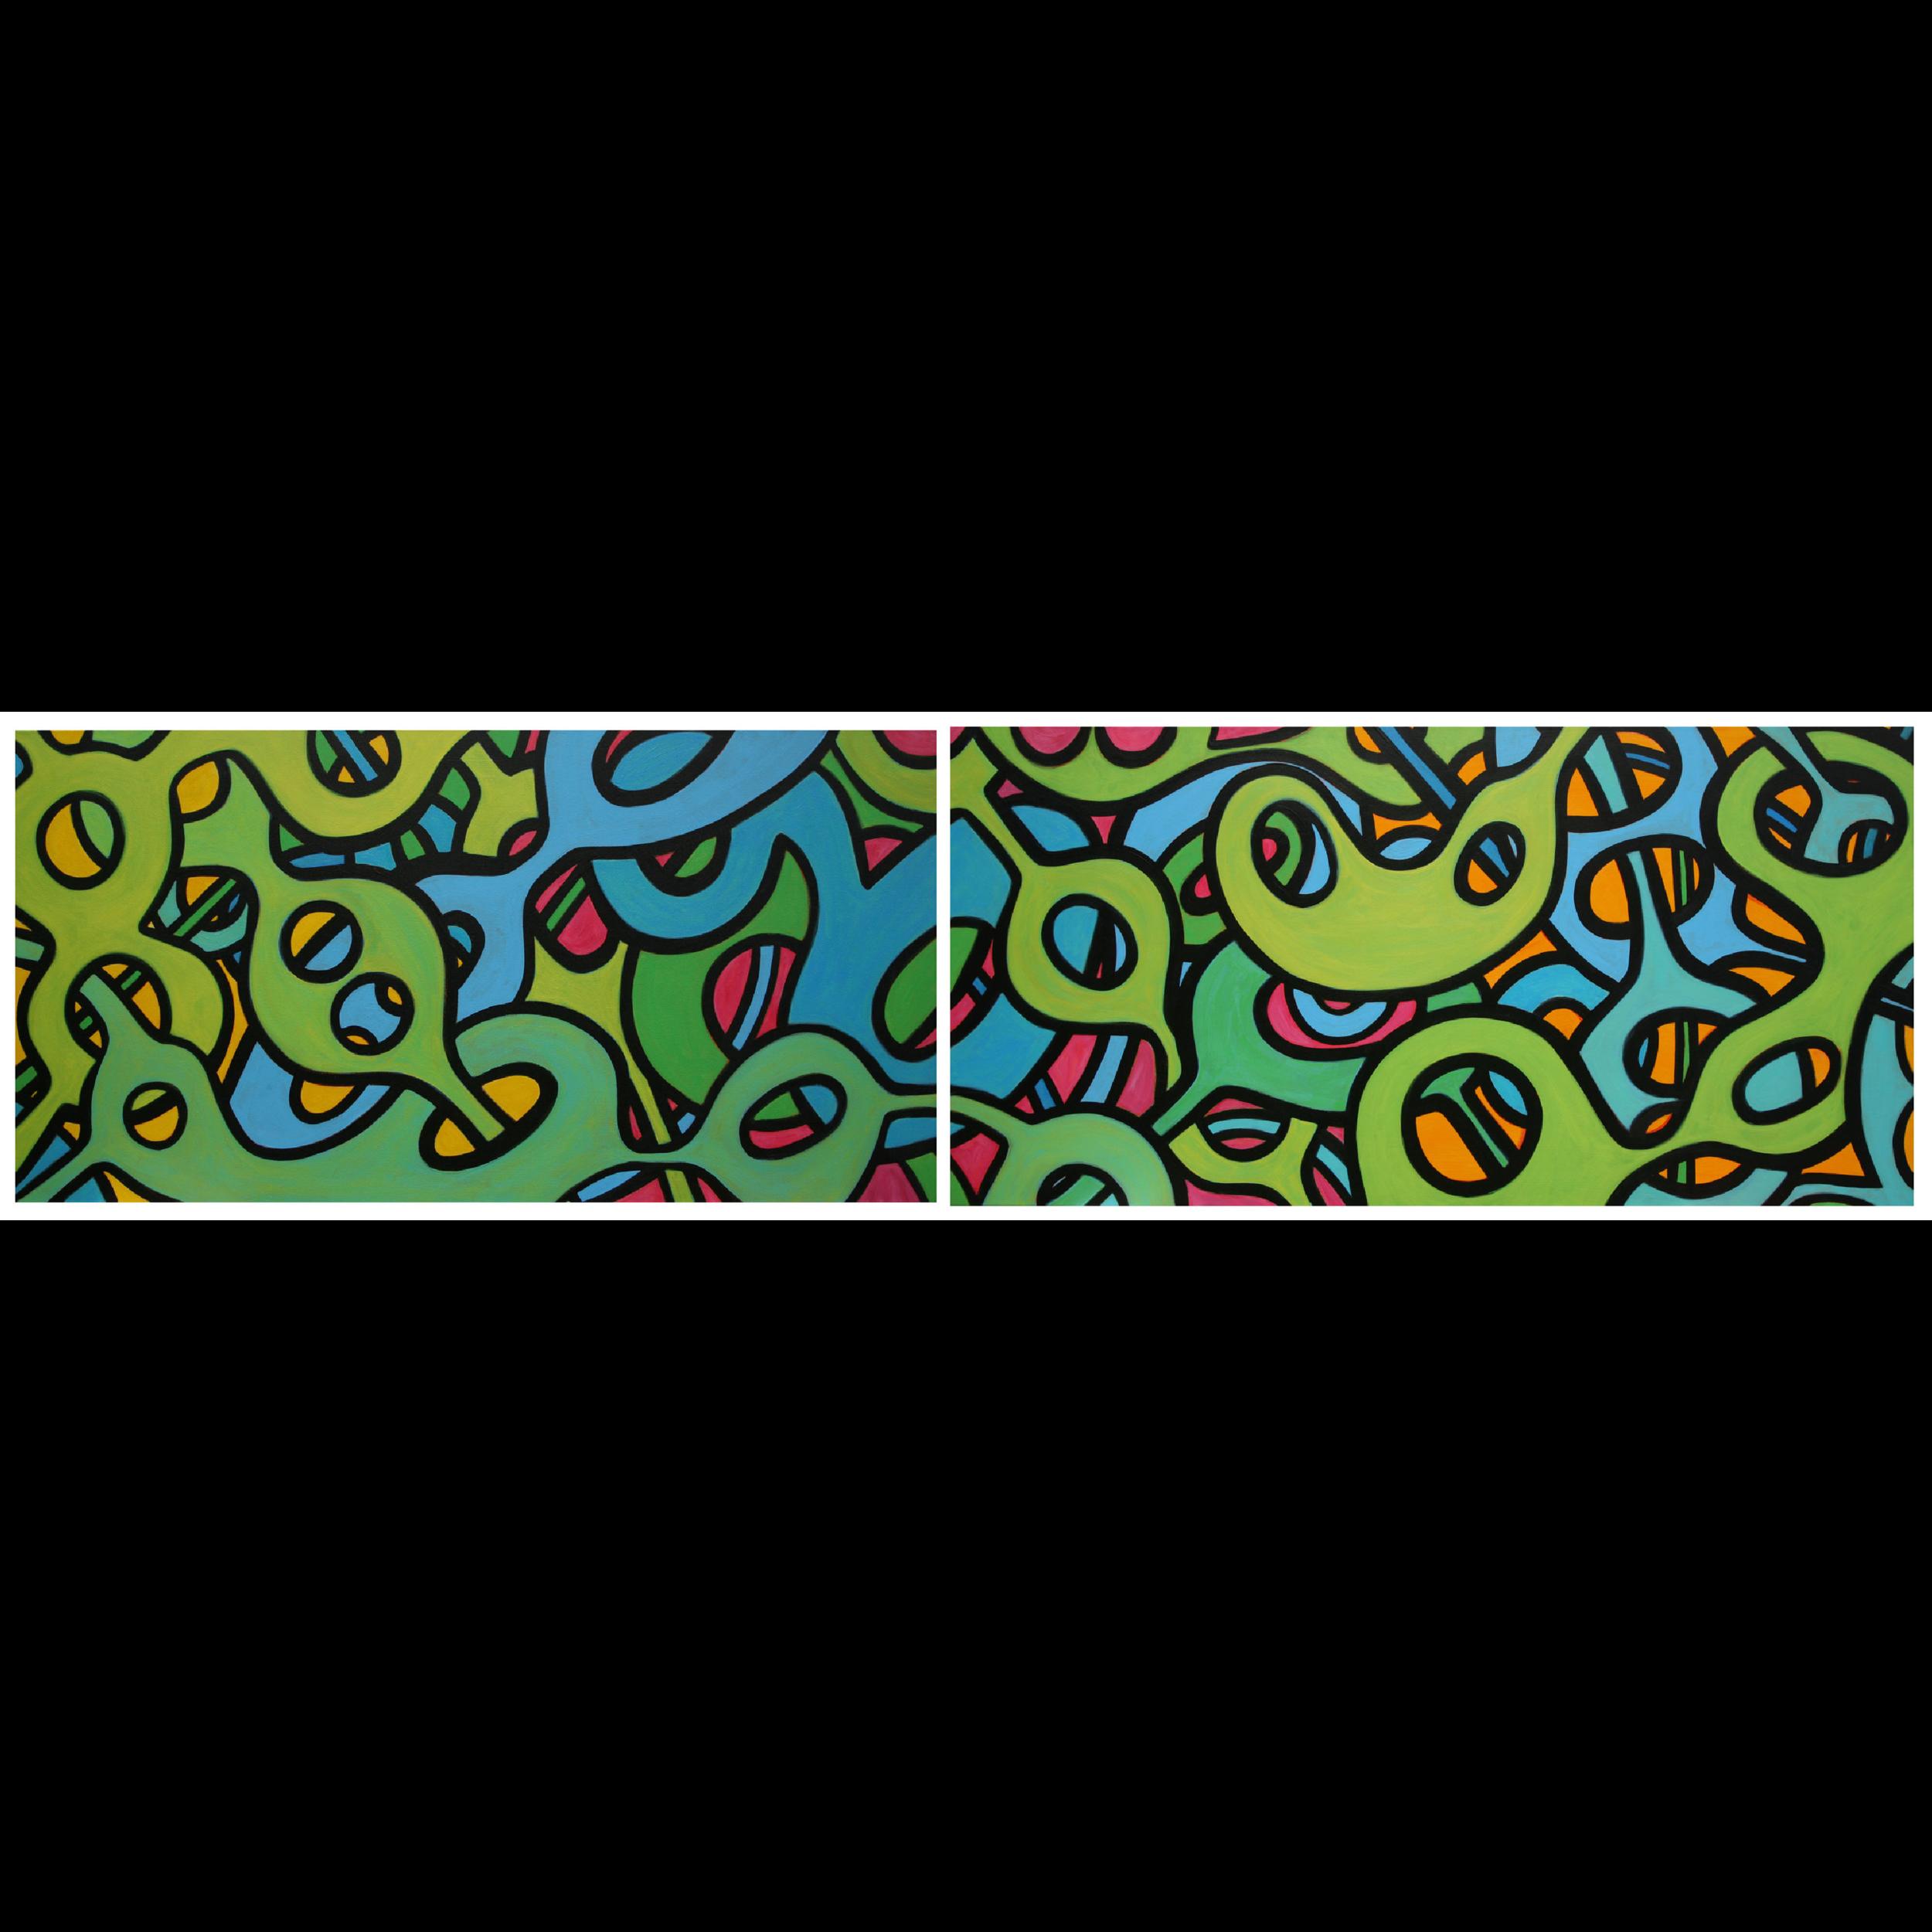 Inertia in Motion, in Gold, Fushia and Tangerine, 2013